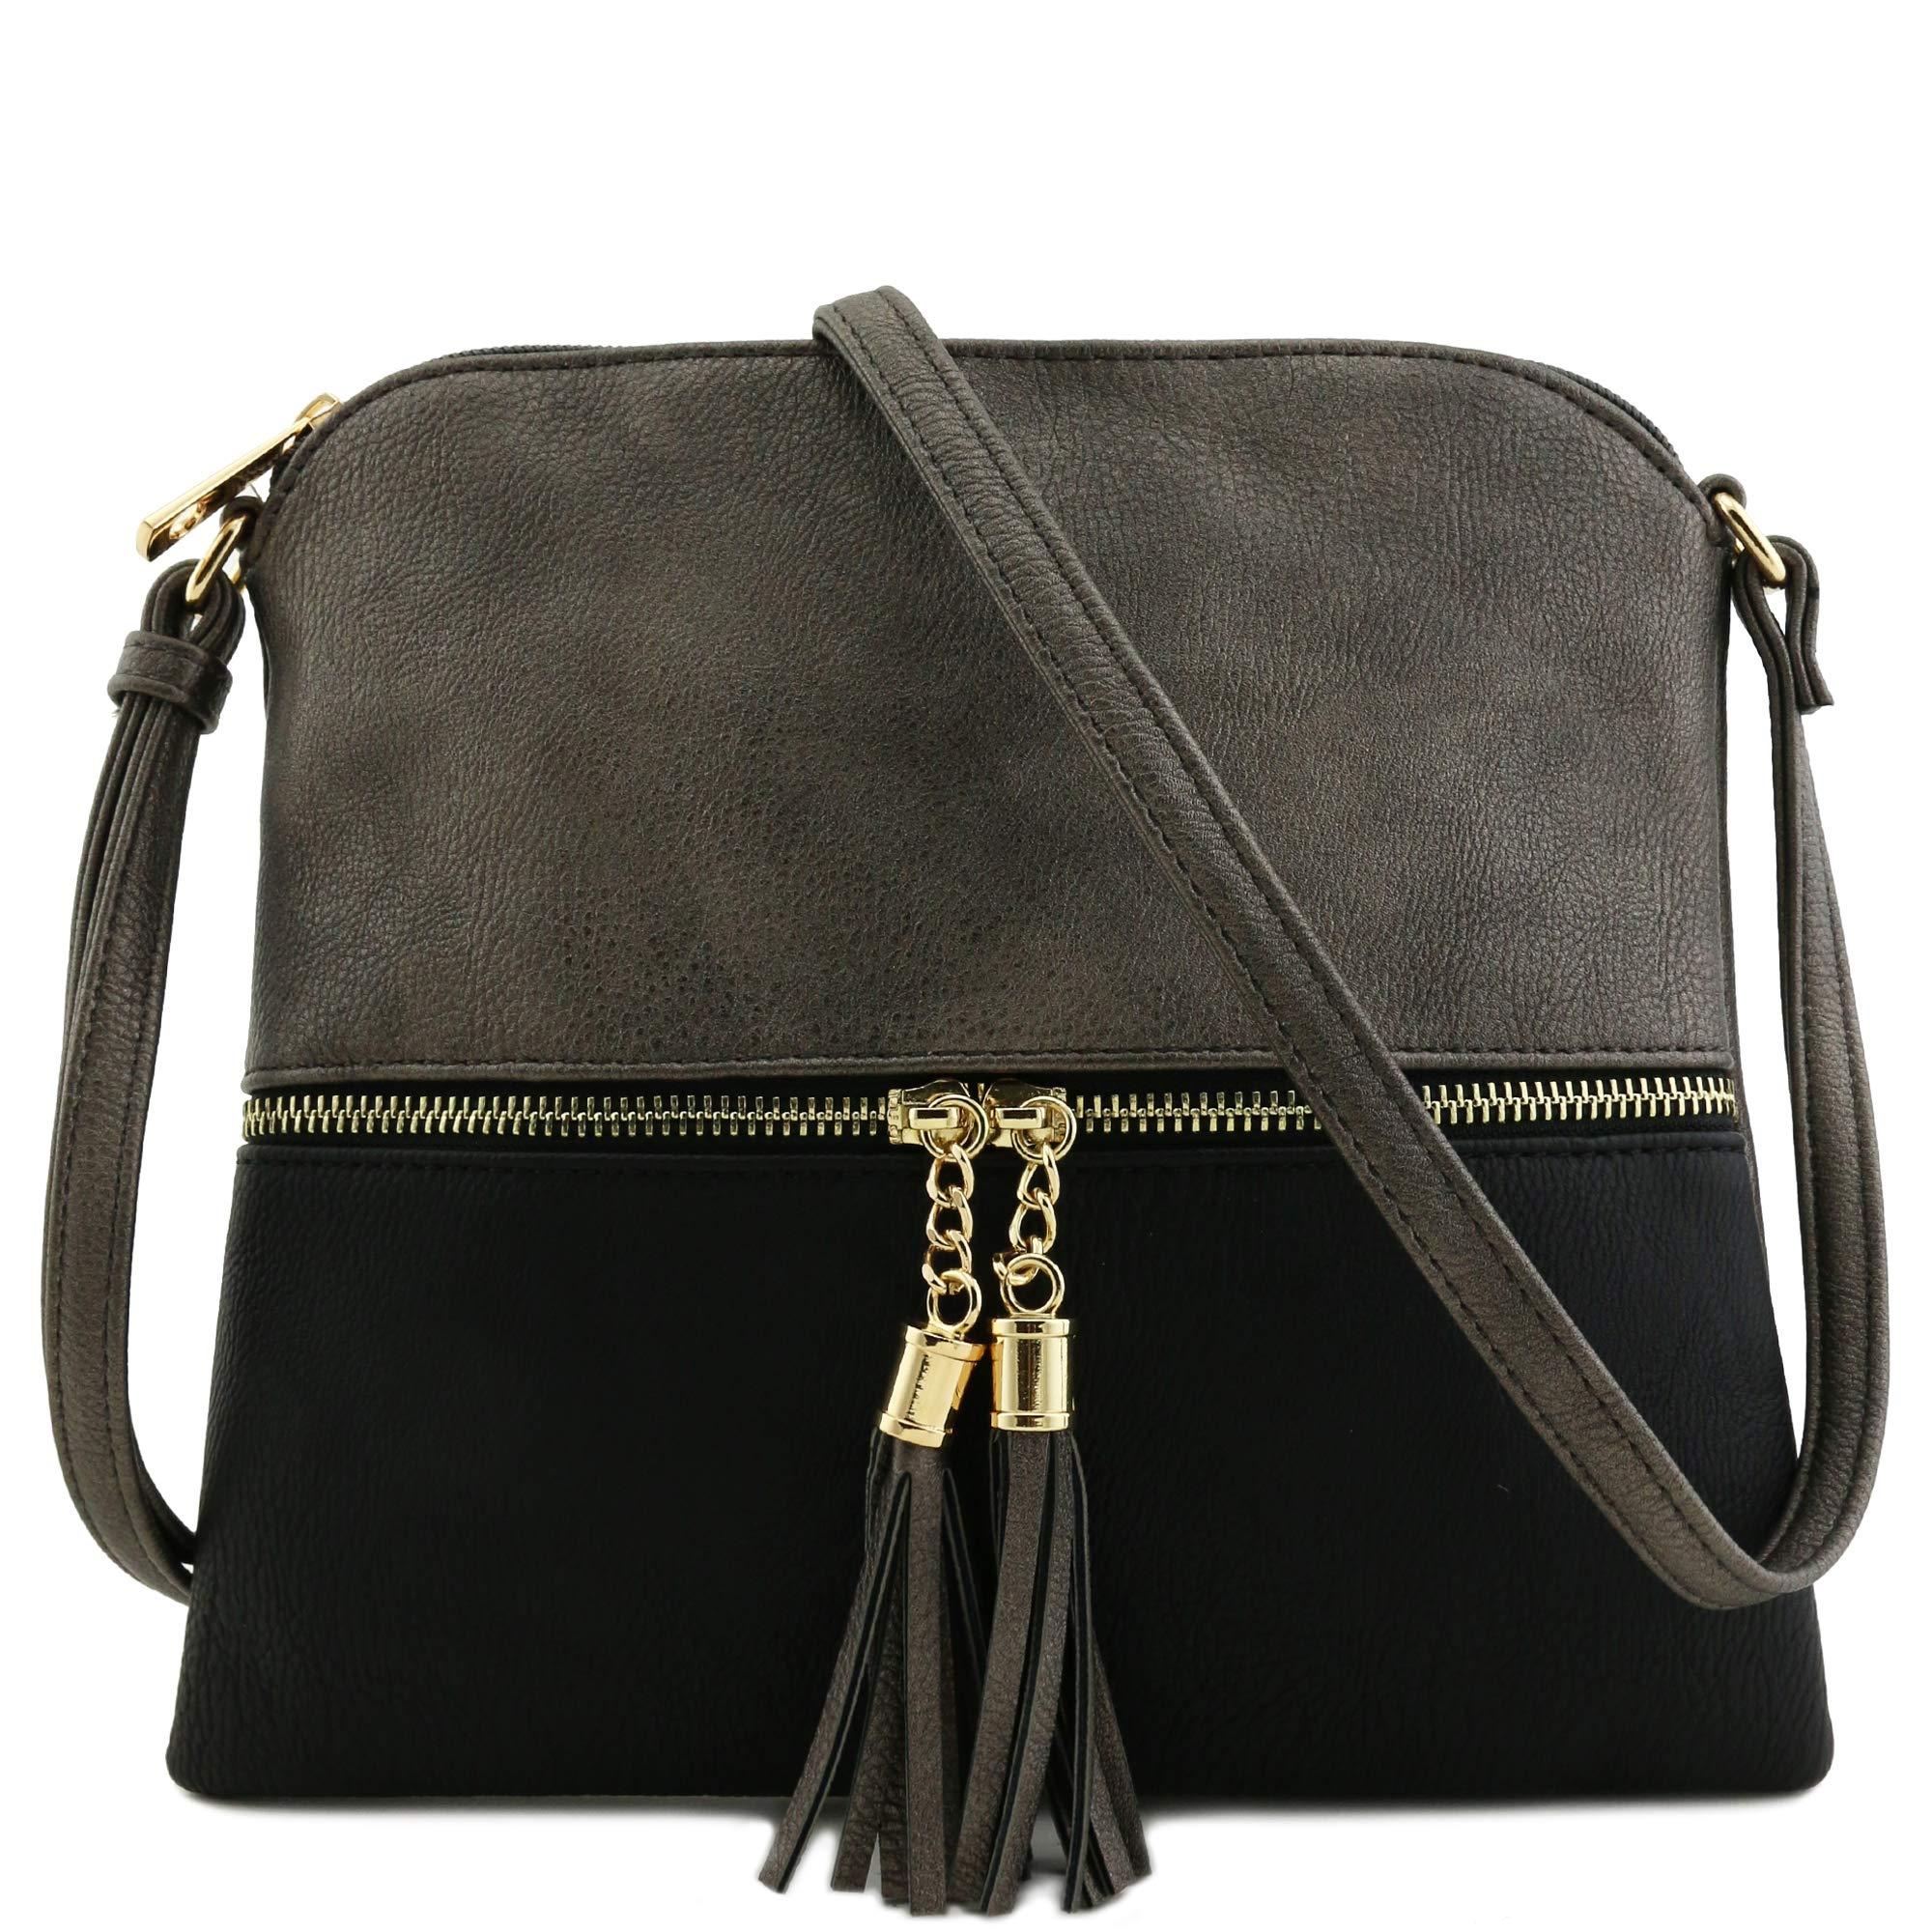 Lightweight Color-block Medium Crossbody Bag with Tassel (Pewter/Black)